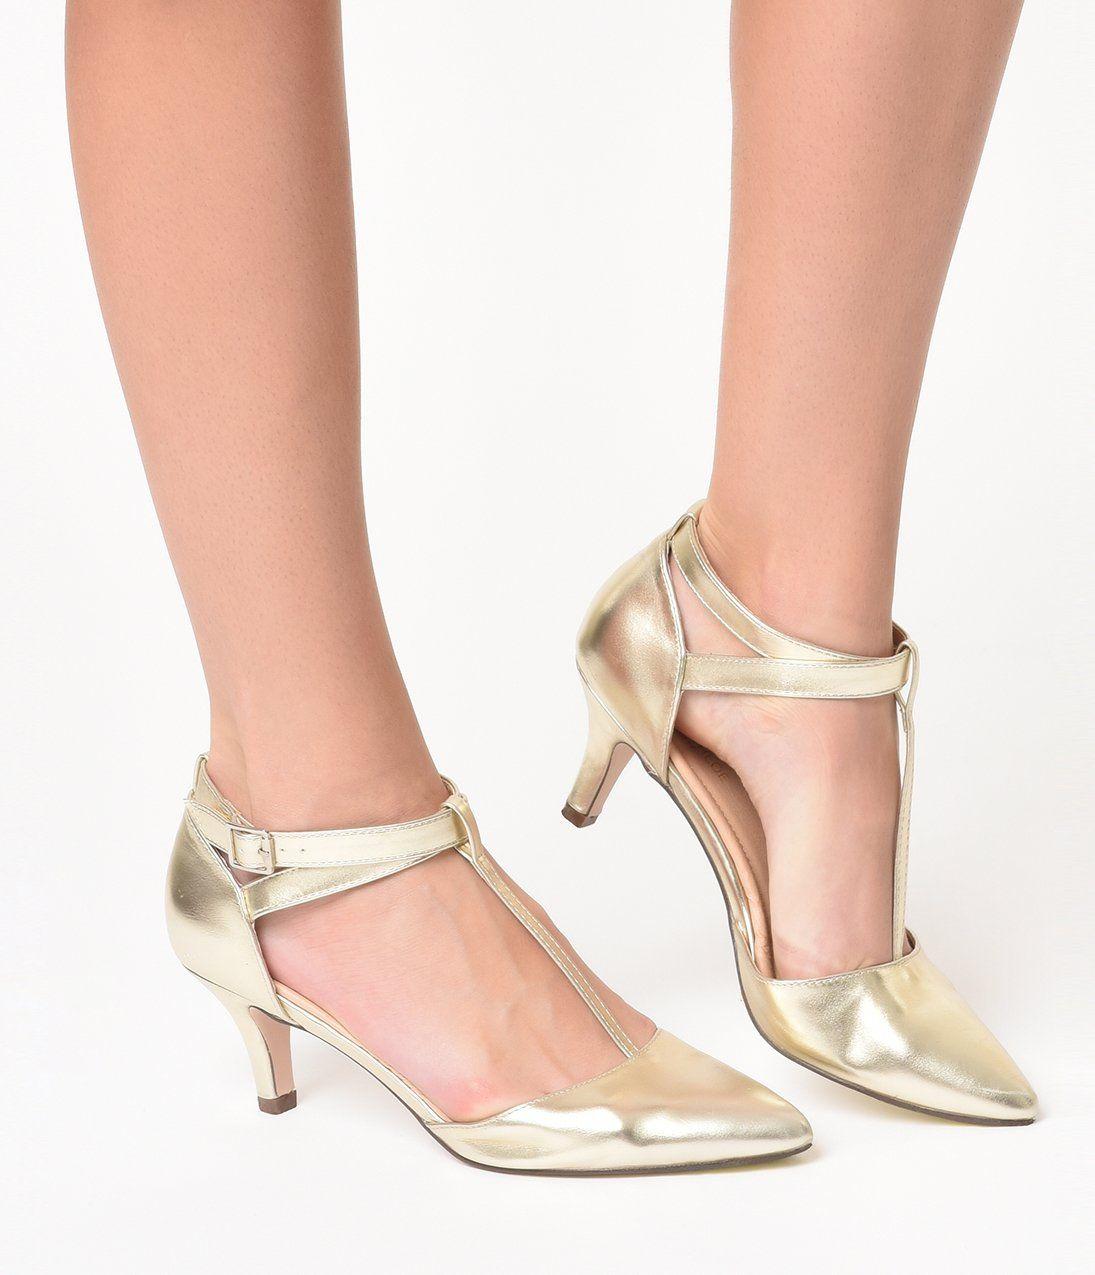 Metallic Gold Leatherette Pointed Toe Ellie T Strap Heels Vintage Shoes Women T Strap Heels T Strap Shoes